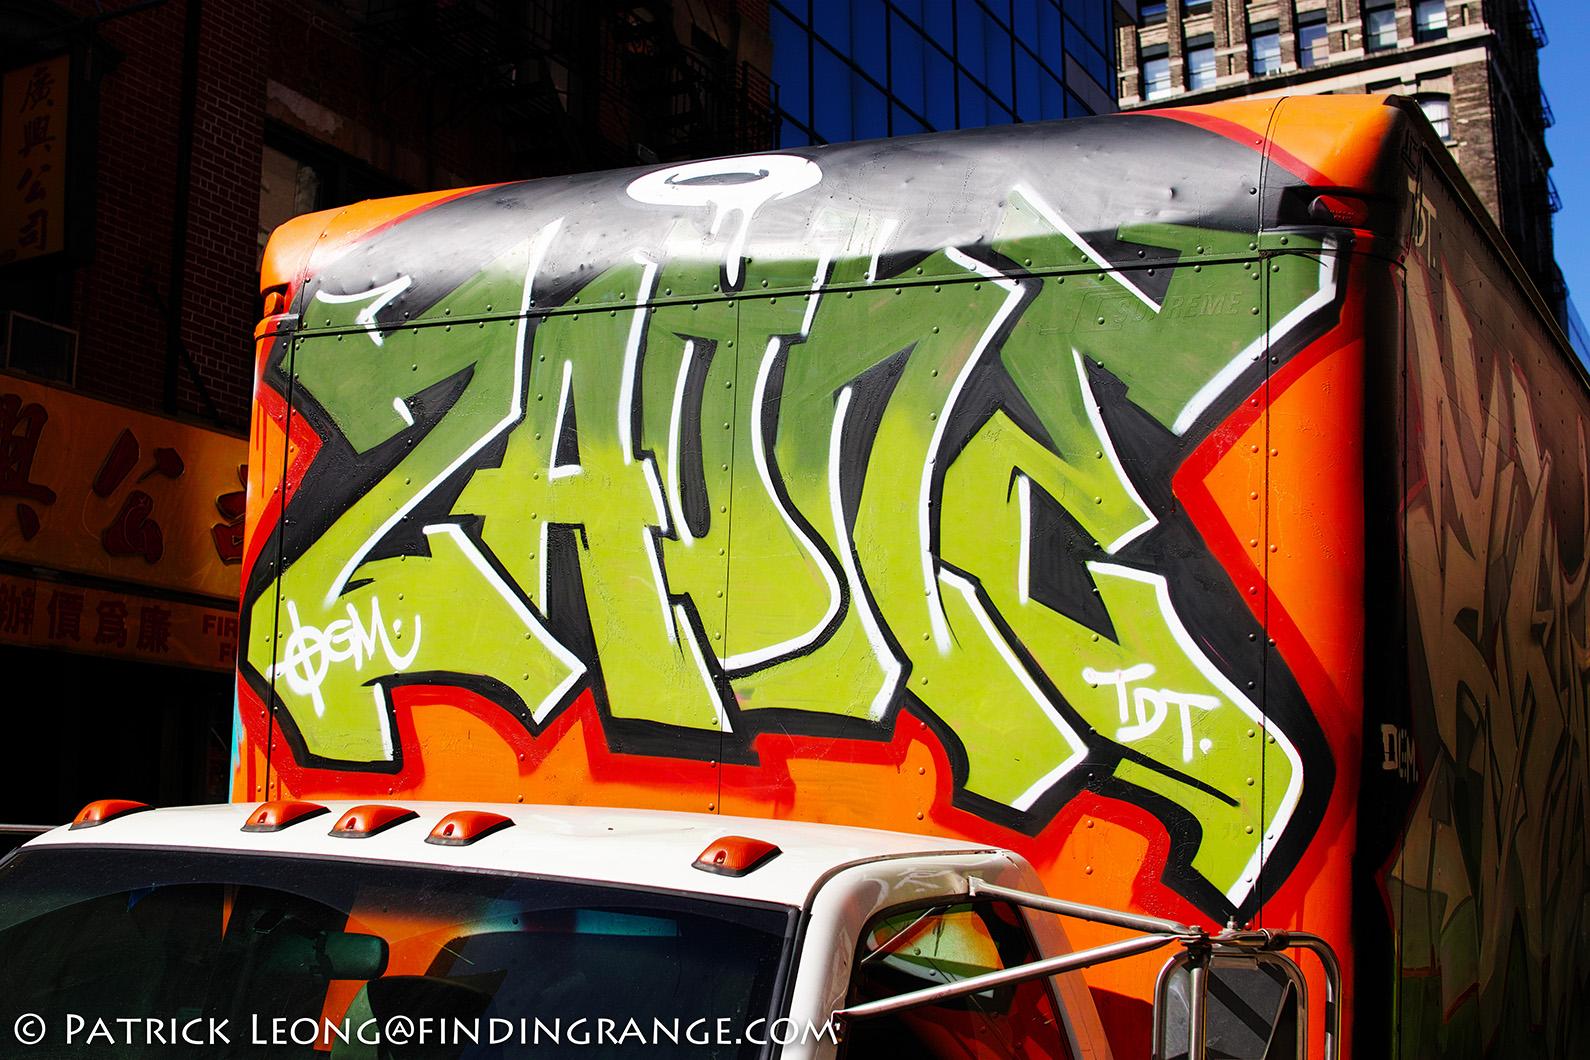 sigma-sd-quattro-30mm-f1-4-art-lens-graffiti-on-truck-new-york-city